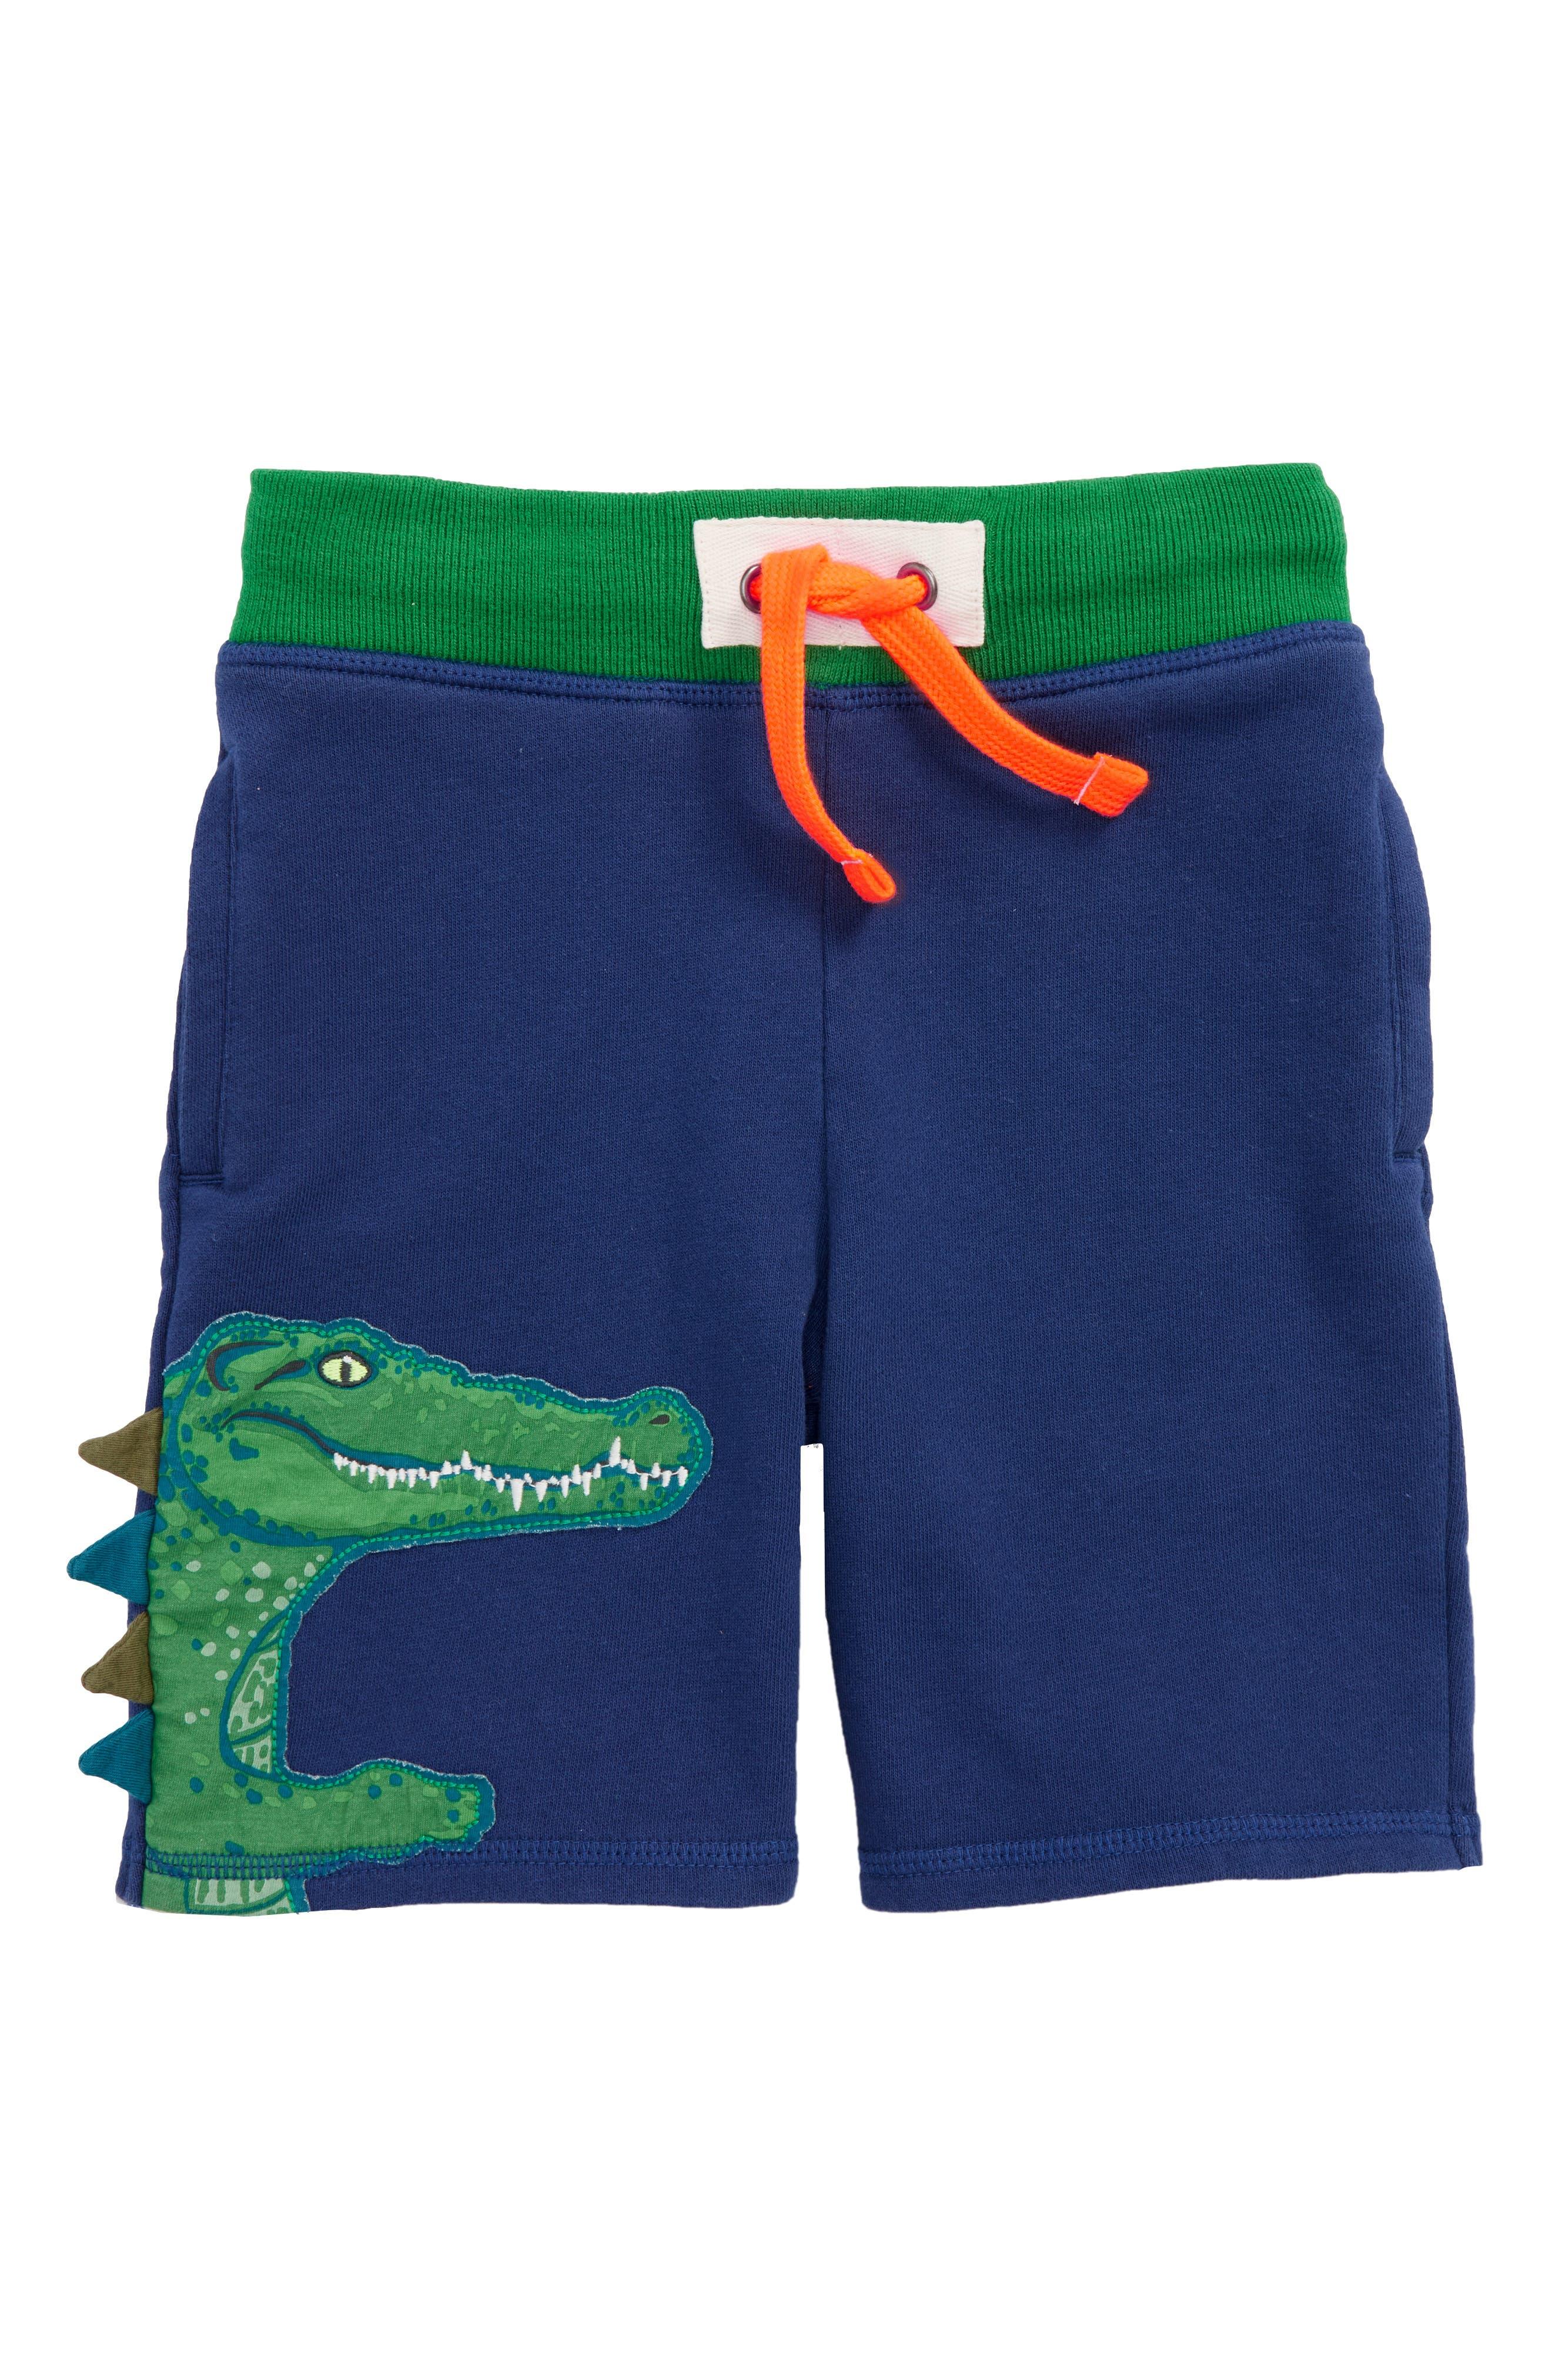 Crocodile Appliqué Sweat Shorts,                             Main thumbnail 1, color,                             Beacon Blue Crocodile